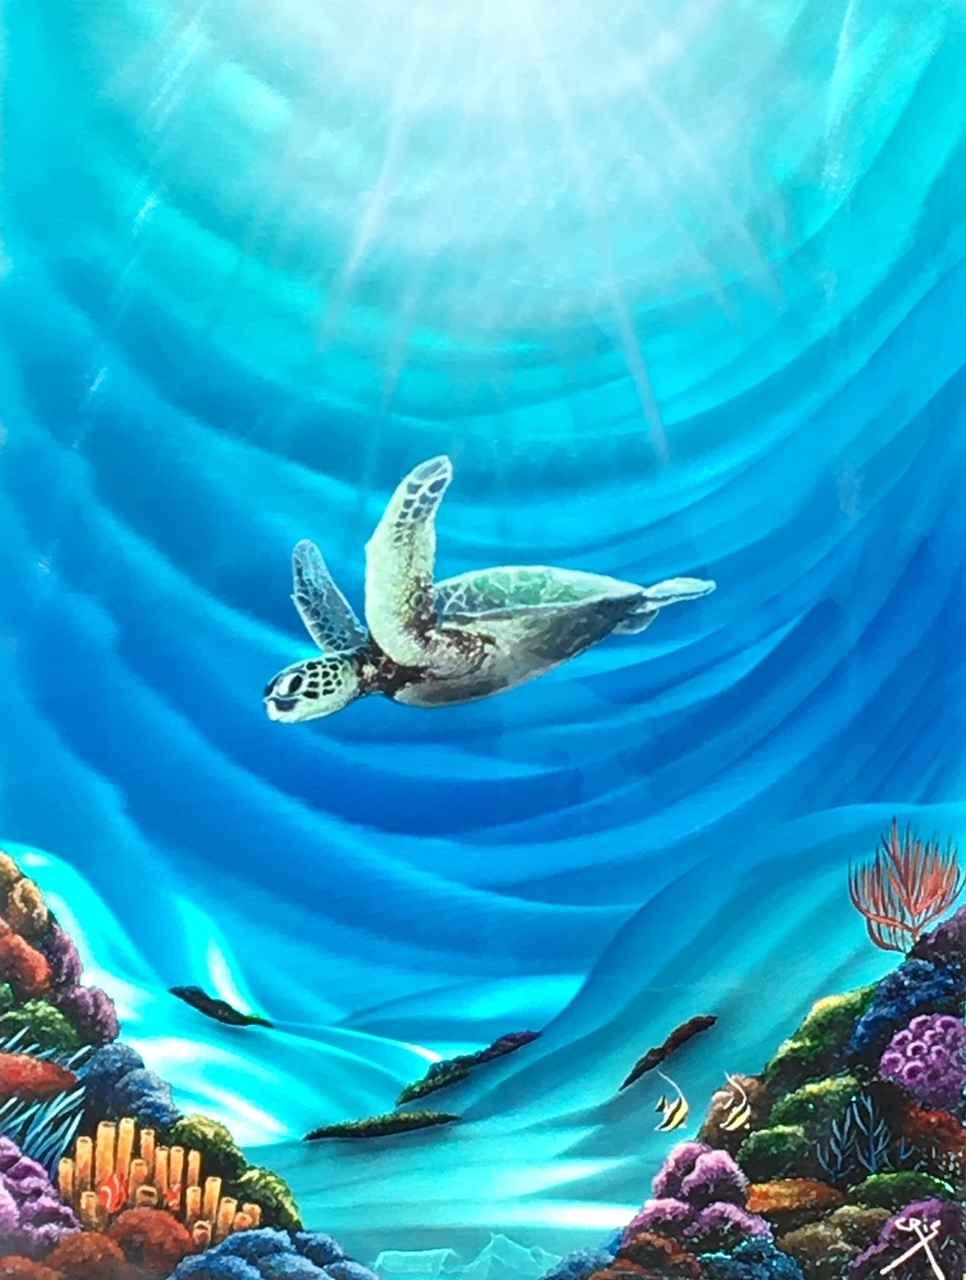 Fly-By by  Cris Woloszak - Masterpiece Online